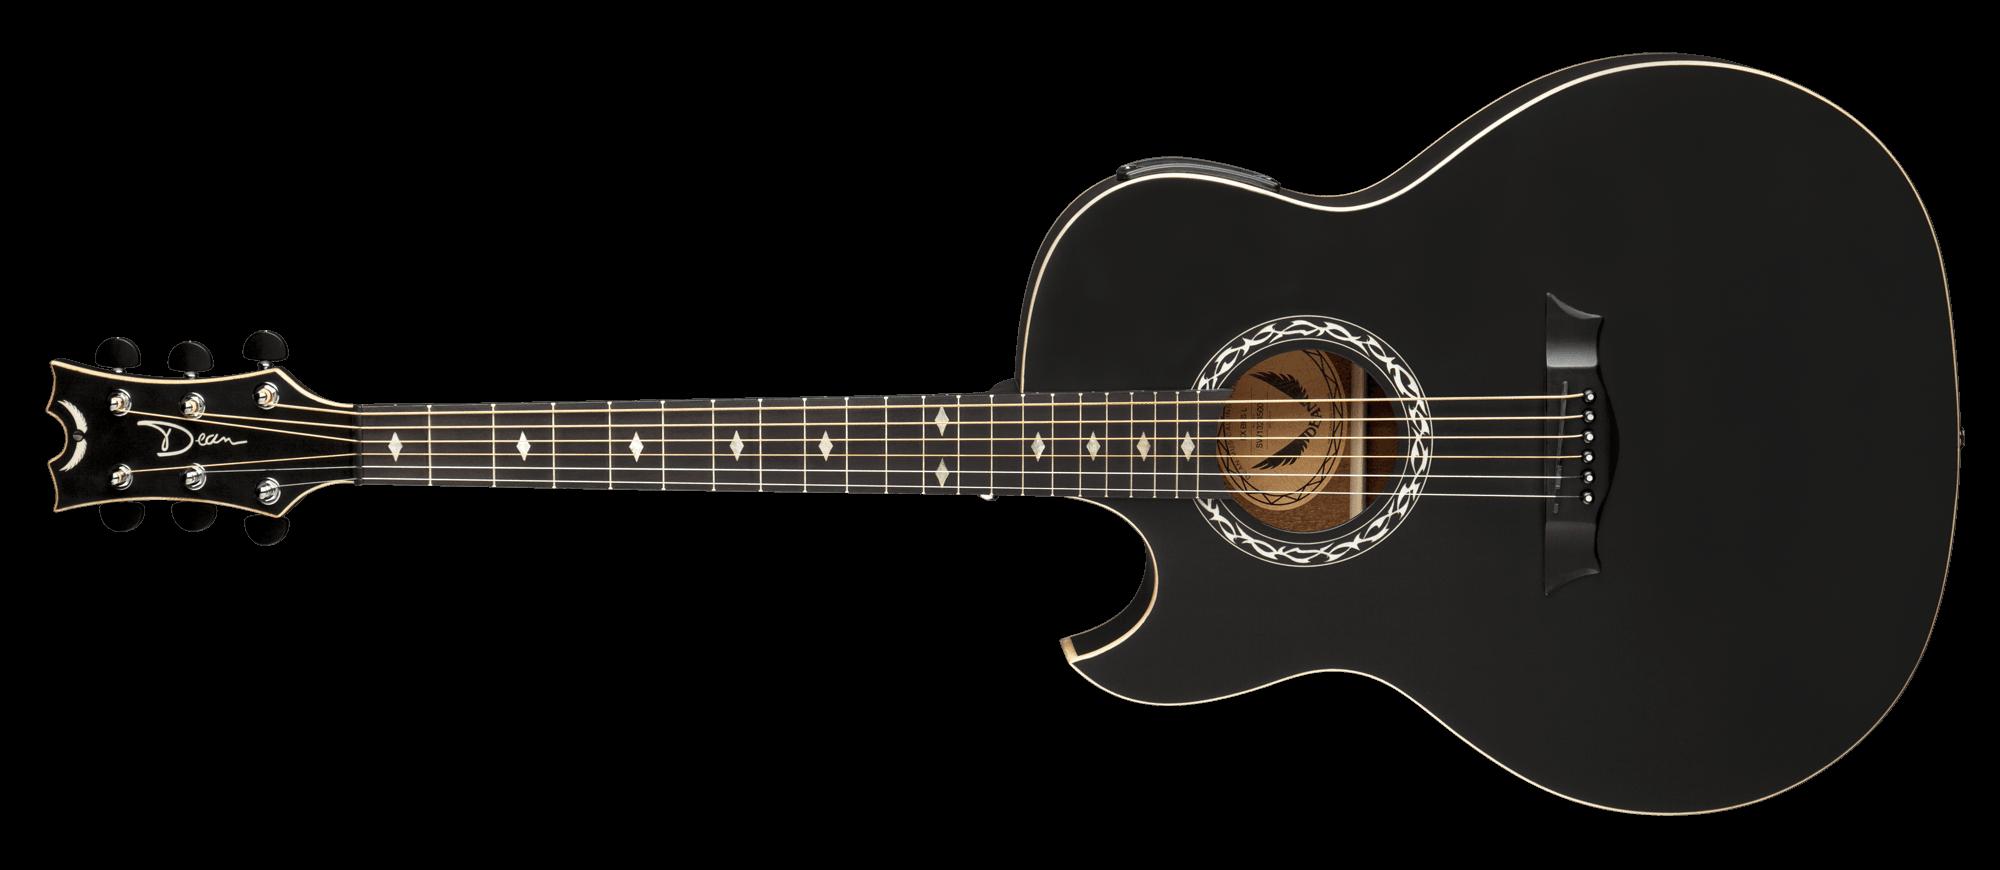 exhibition acoustic electric black satin lefty dean guitars. Black Bedroom Furniture Sets. Home Design Ideas